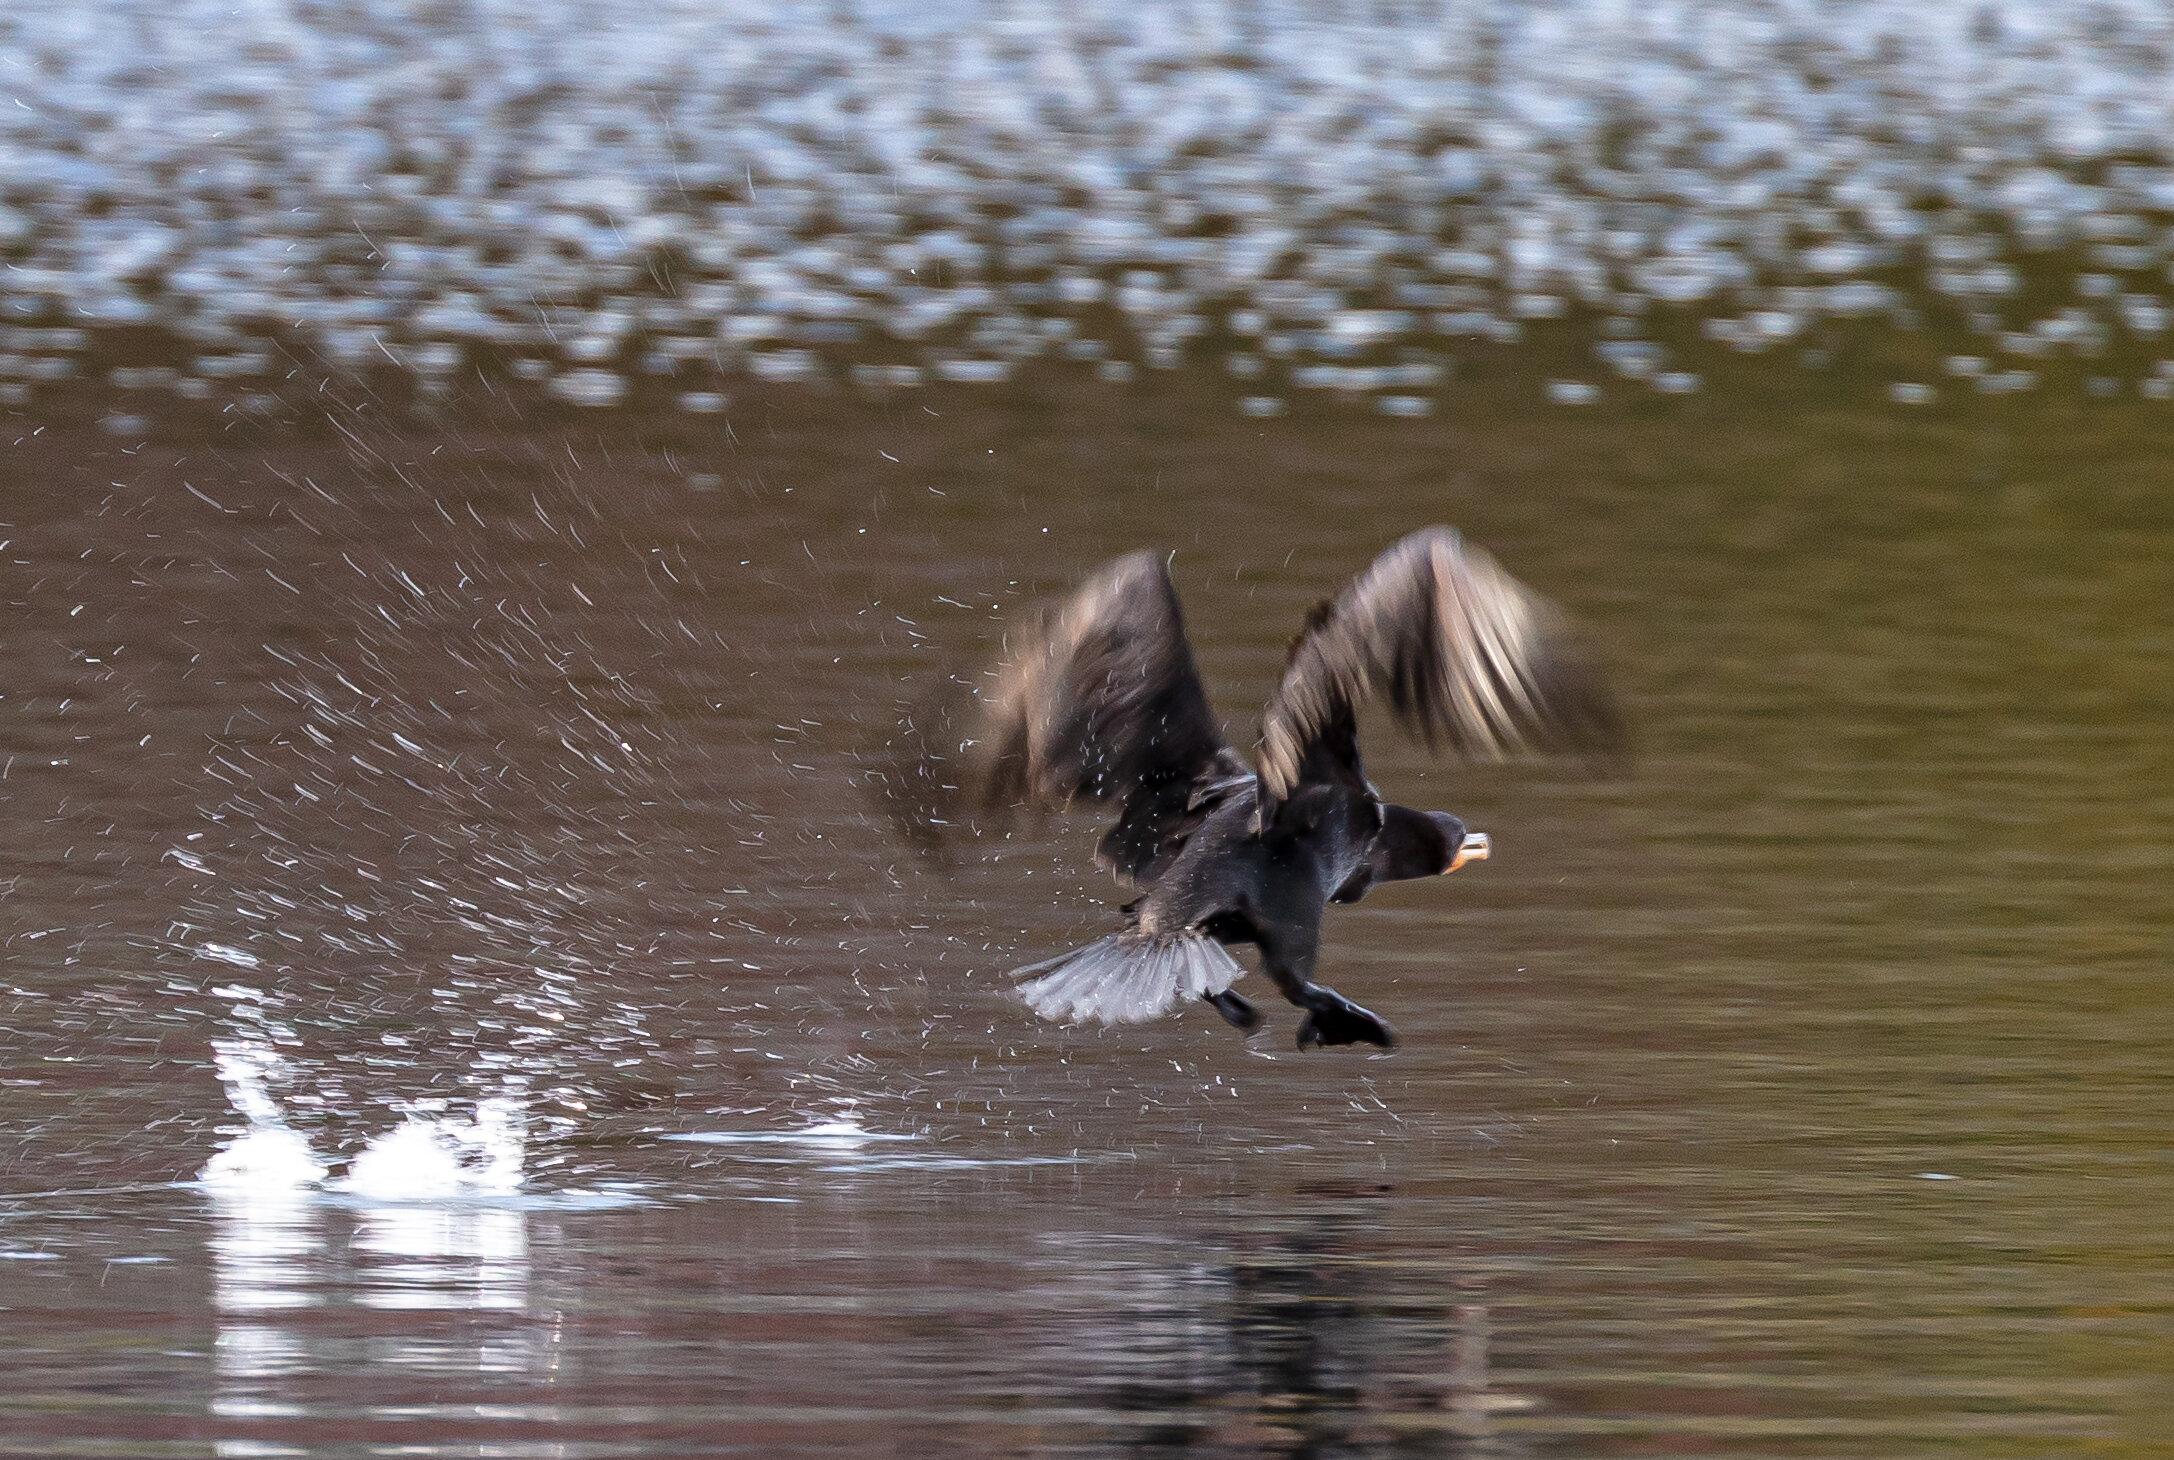 Running Takeoff